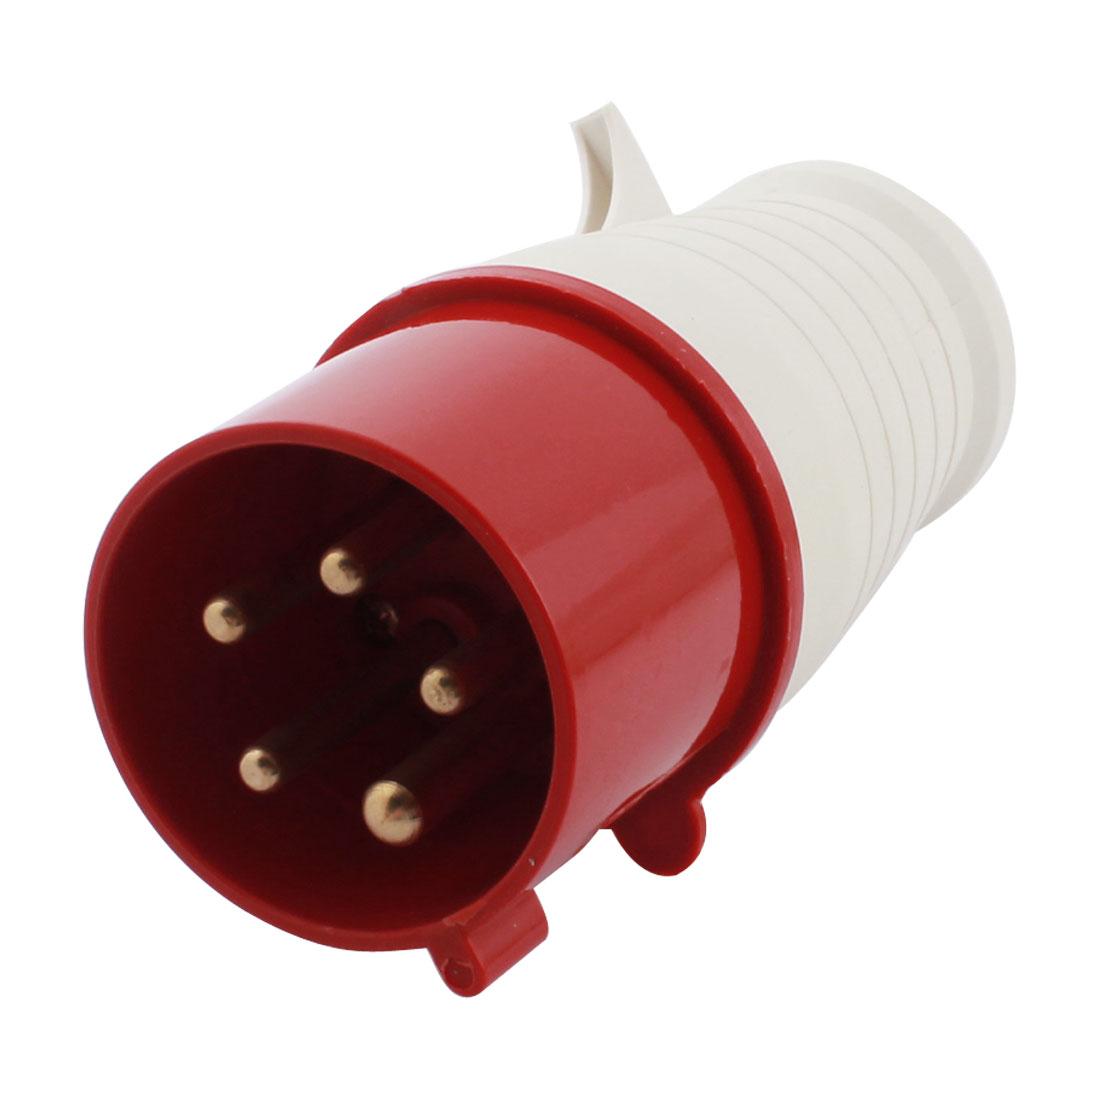 Parts AC 220-380V 240-415V 32A IP67 3P + E + N IEC309-2 Industrial Connector Red